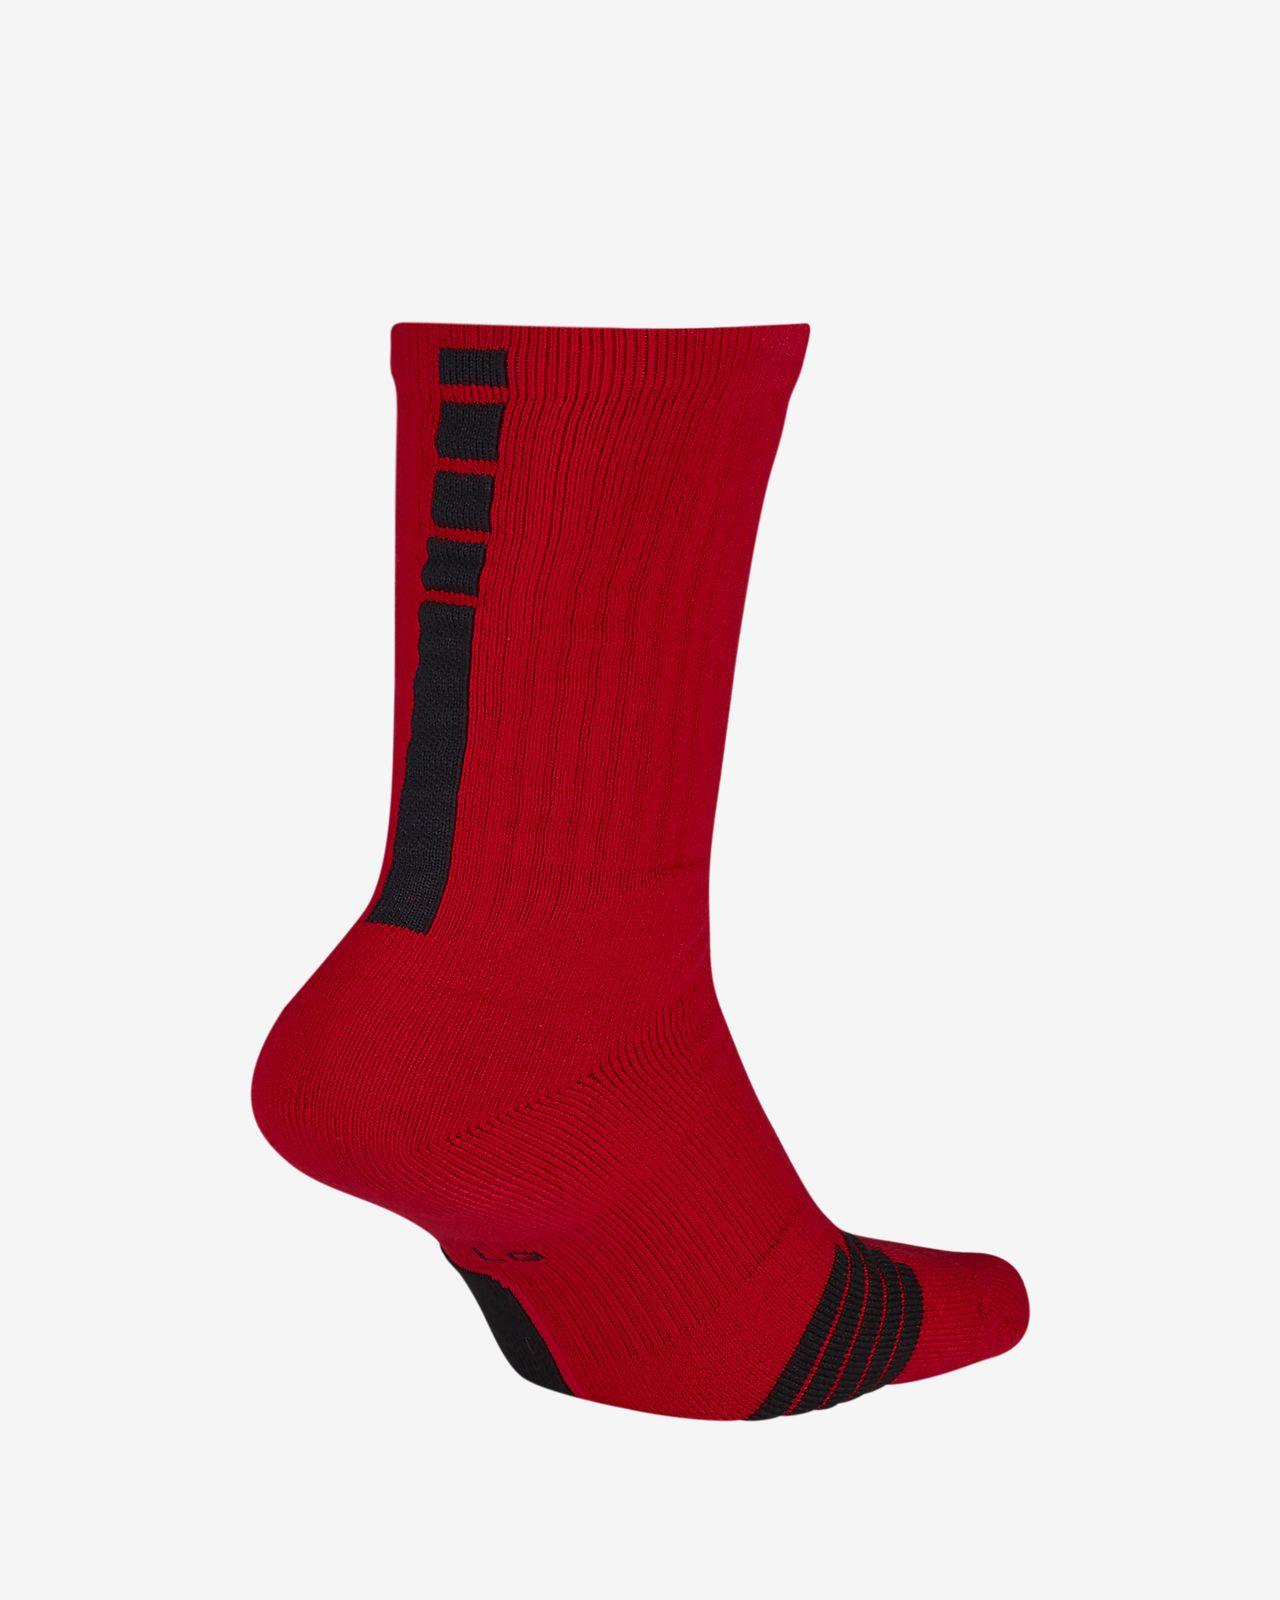 Nike Elite Crew Basketball Socks